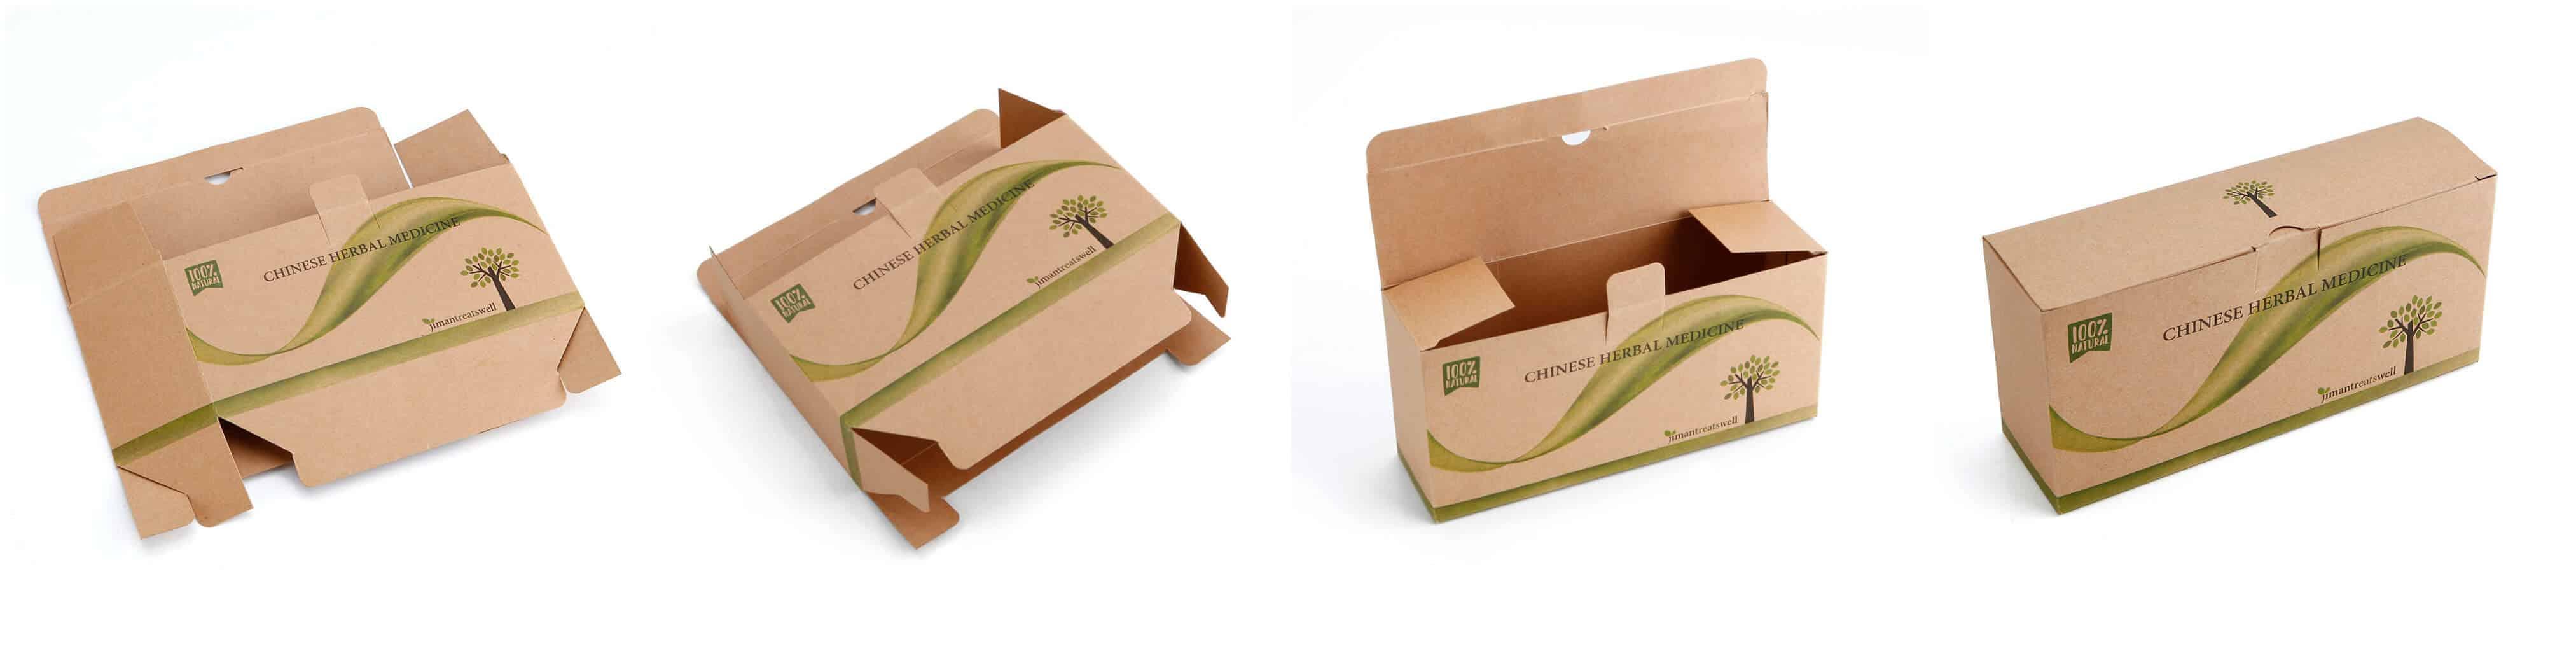 Custom-Medicine-Paper-Box1-b